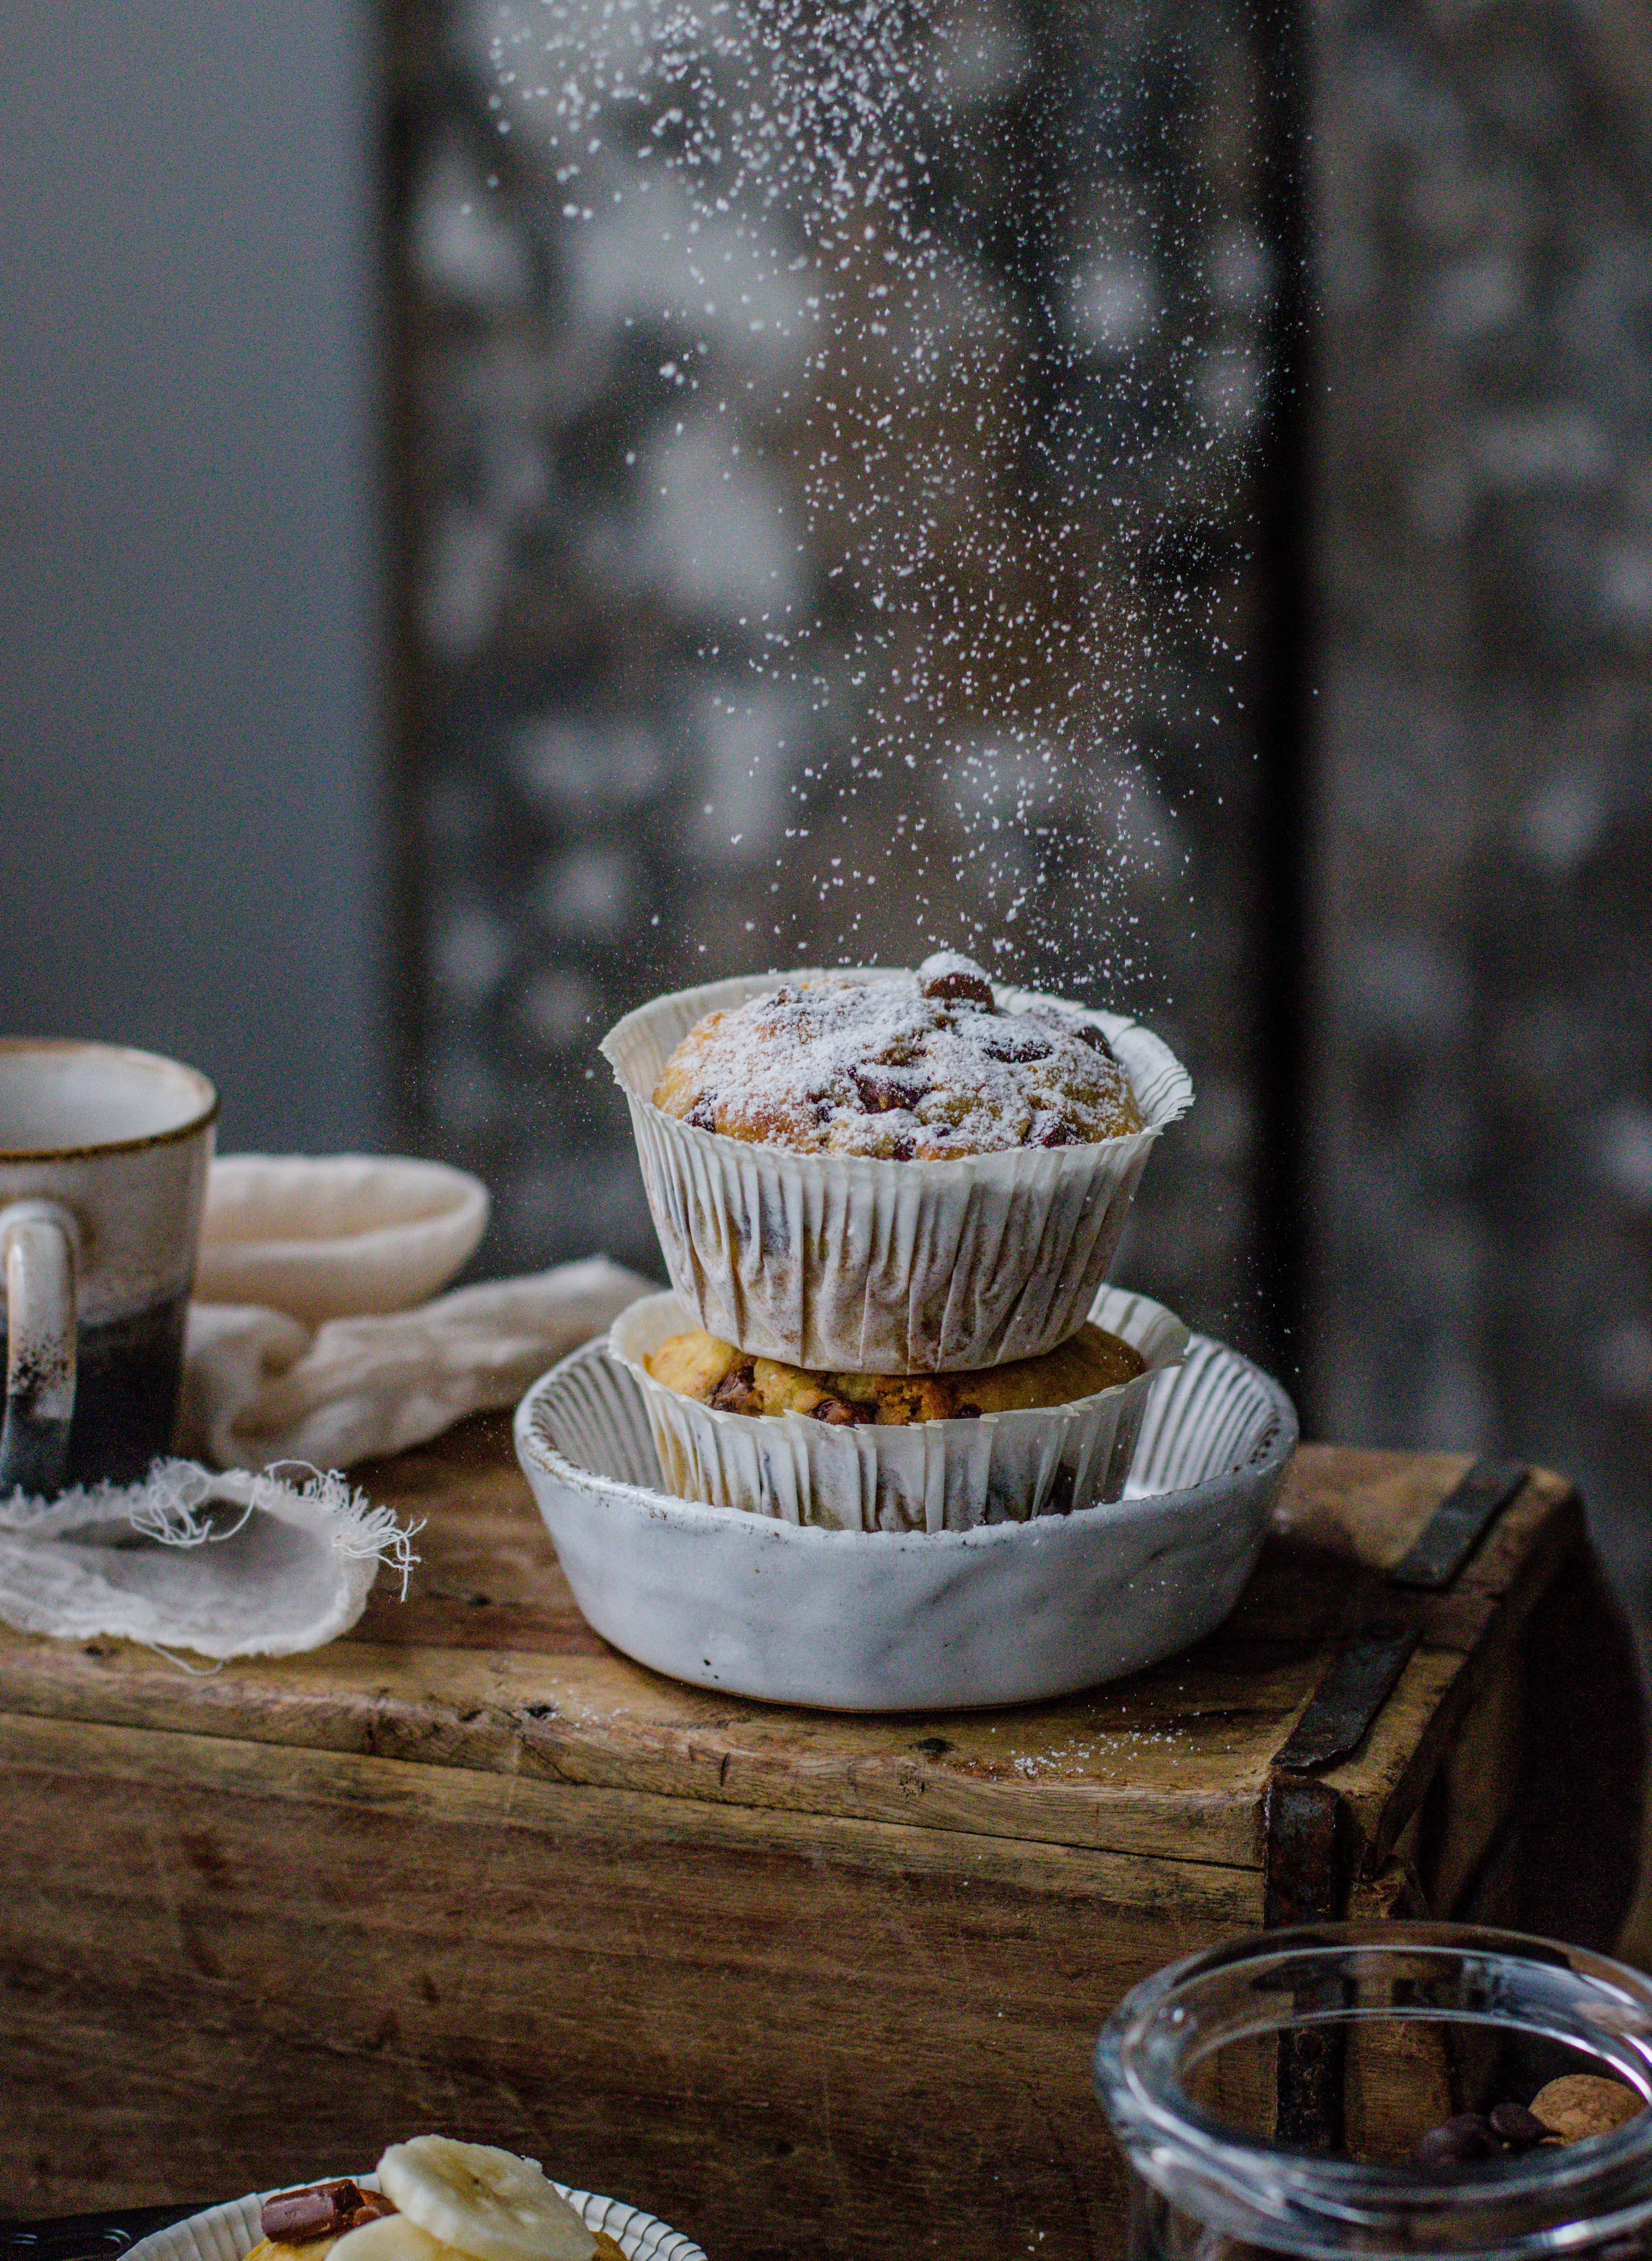 Bananen Schokoladenchip Muffins